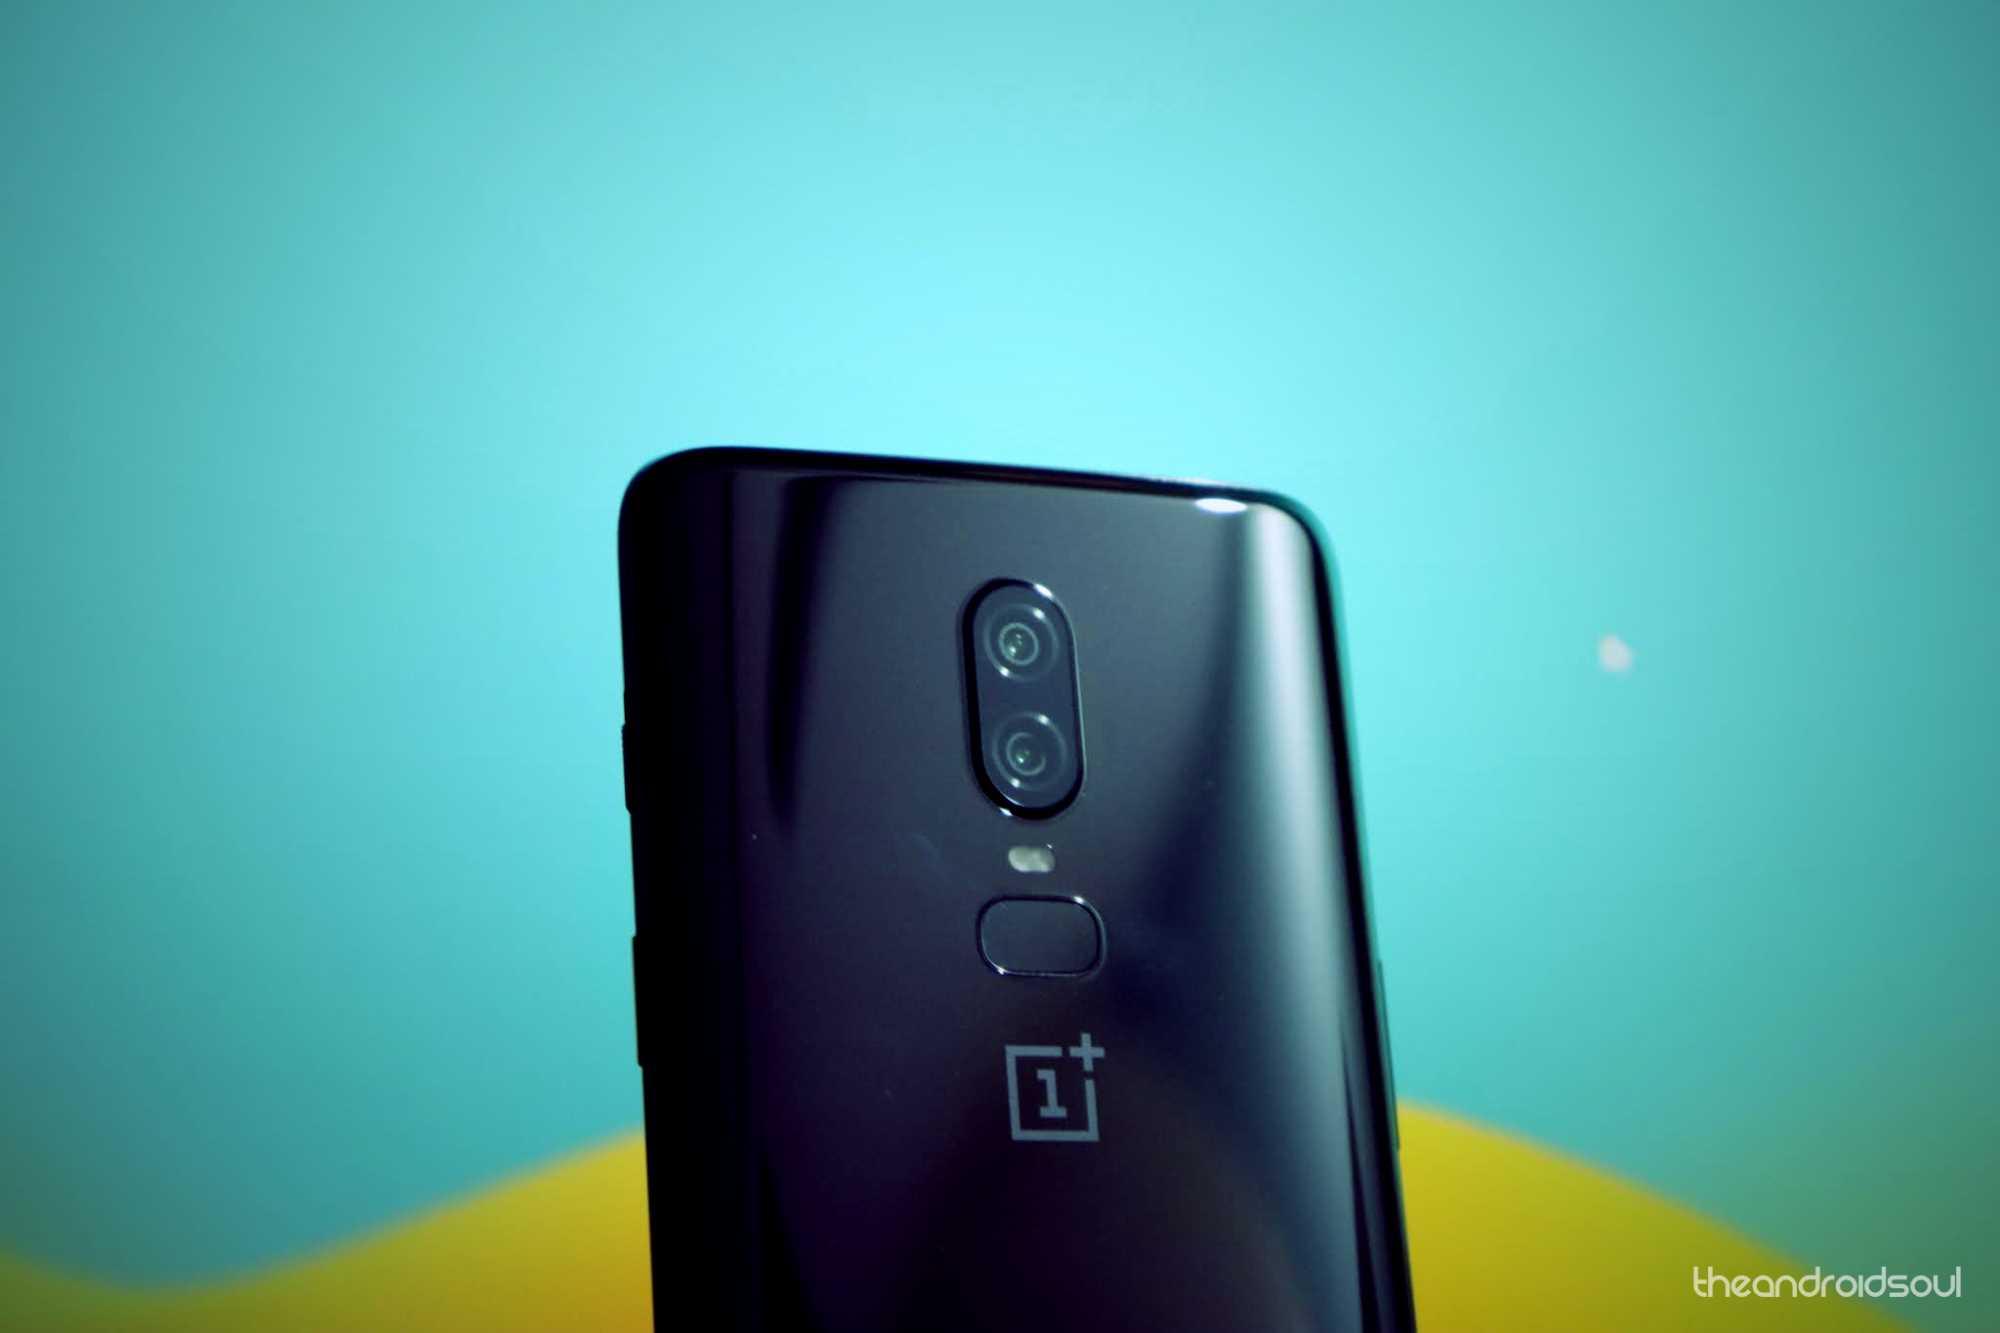 OnePlus-6-mobile-phone